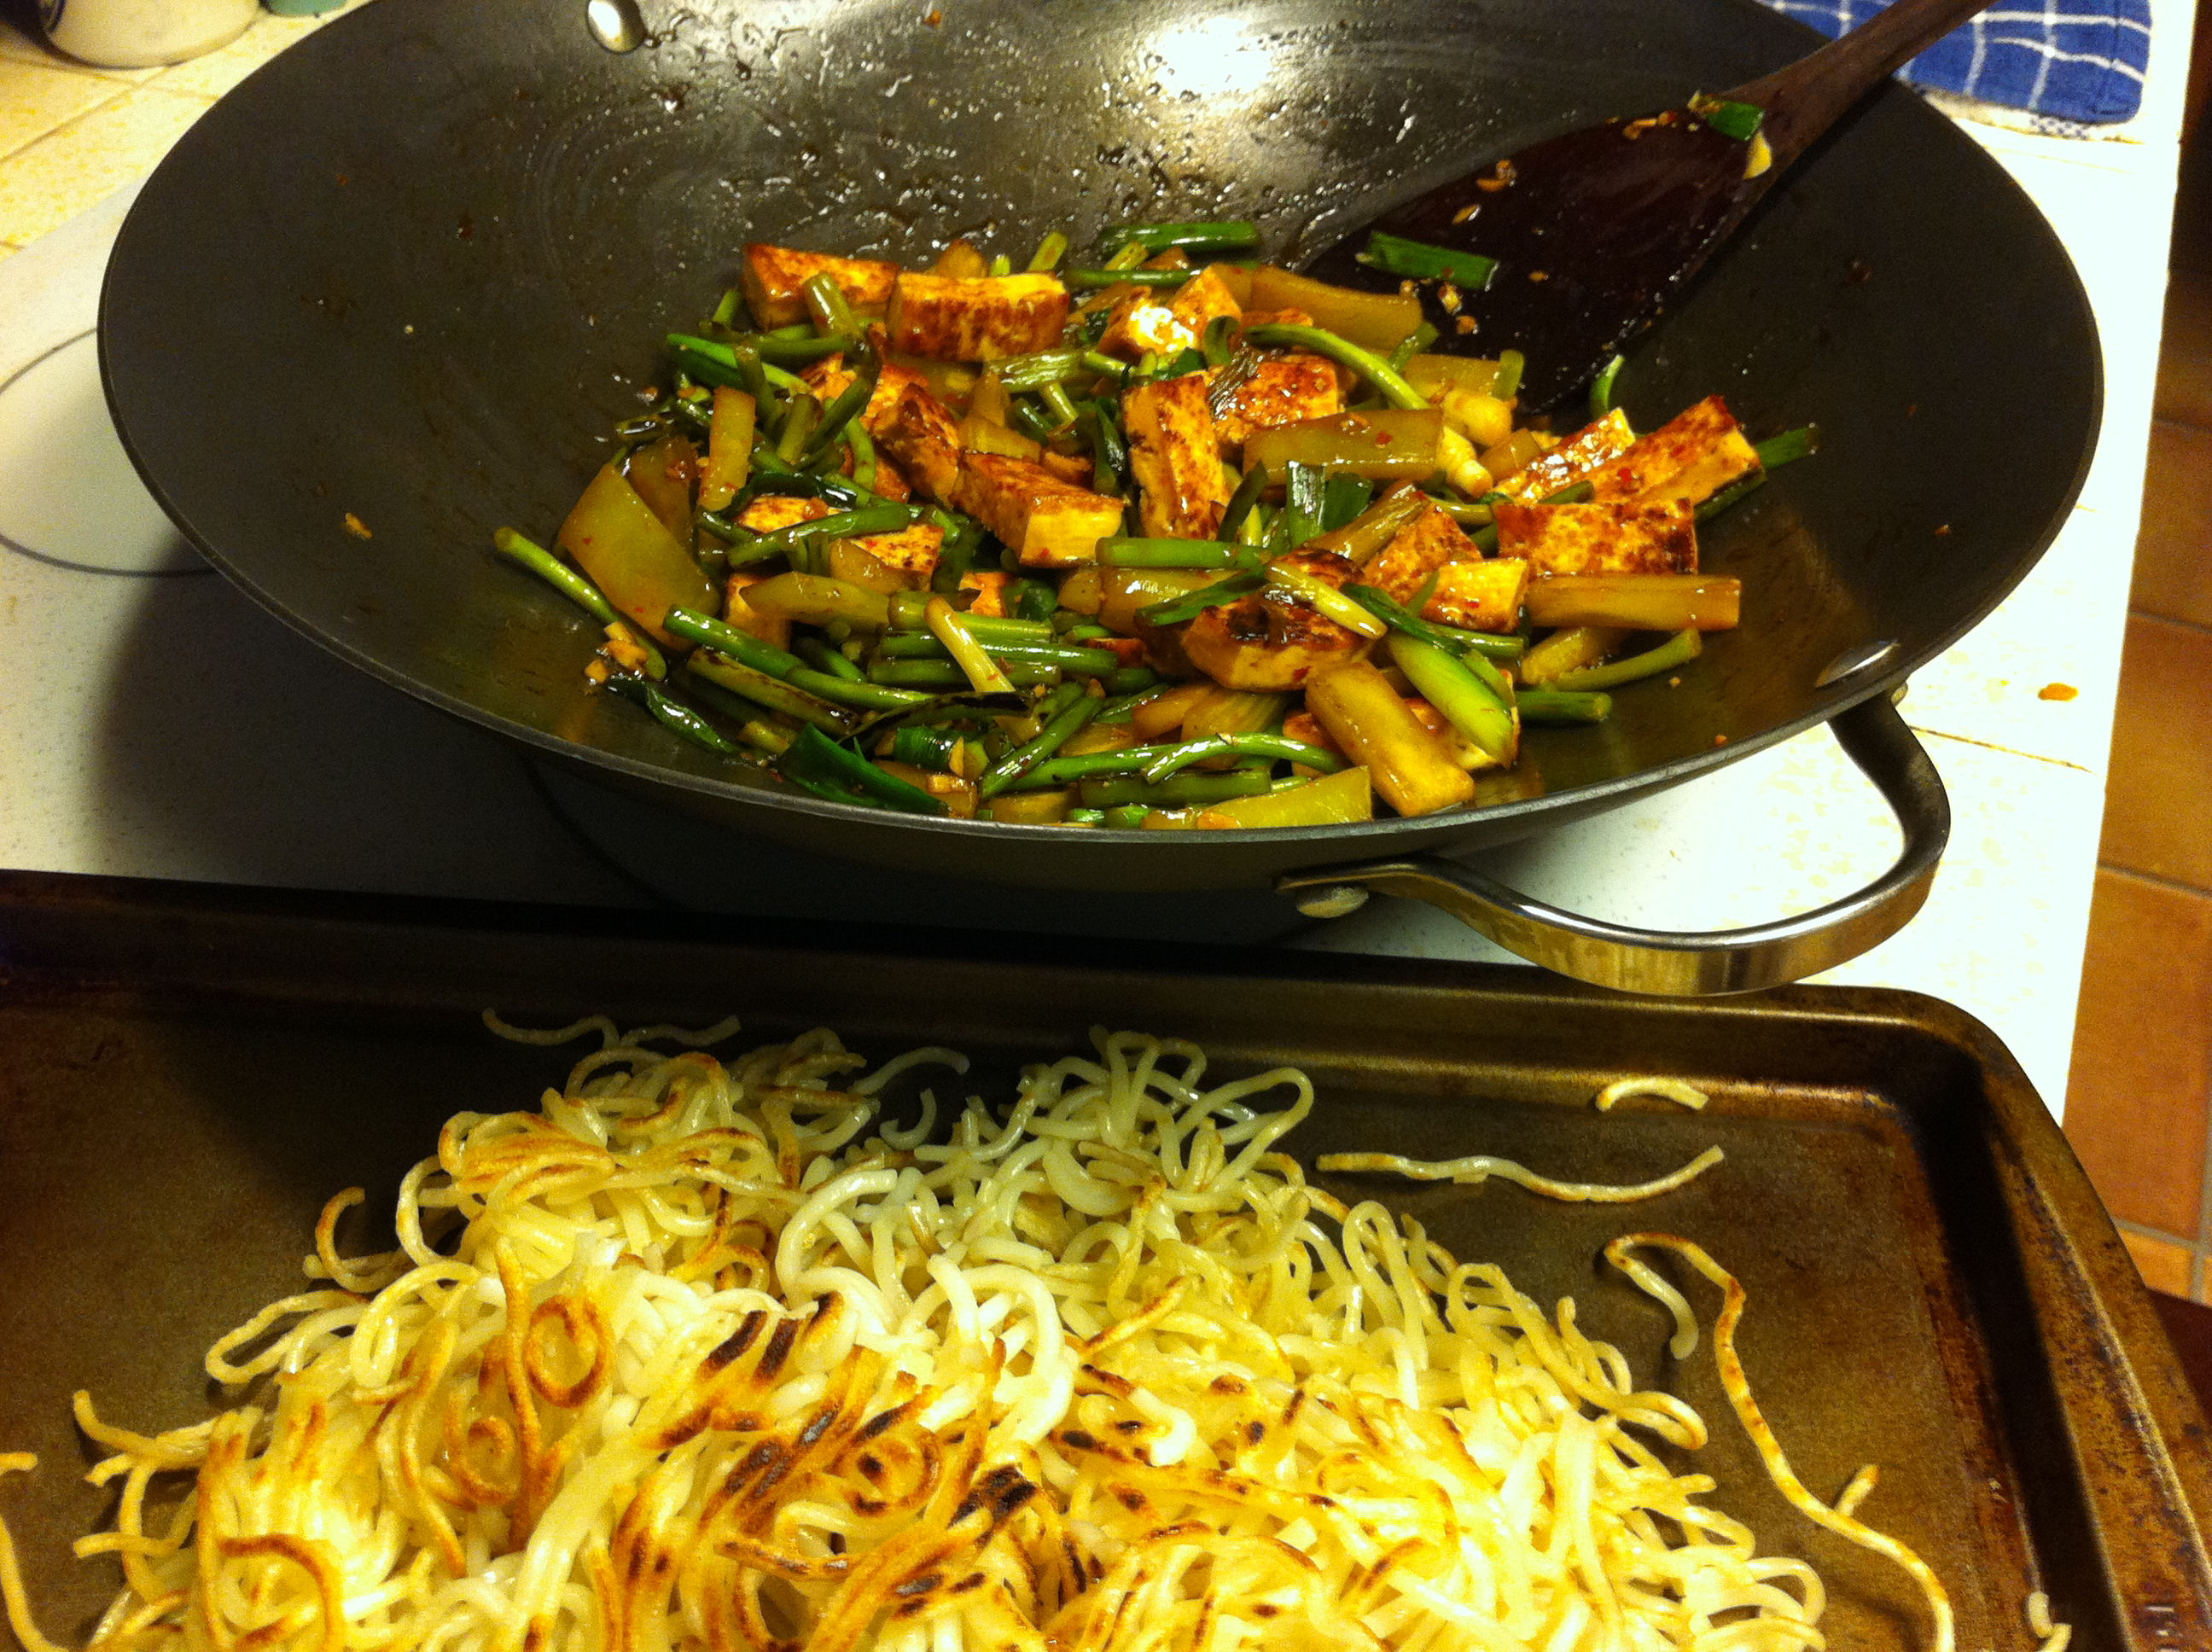 karlu0027s tofu garlic stem and lettuce stem stirfry with pan fried noodles - Stir Fry Pan